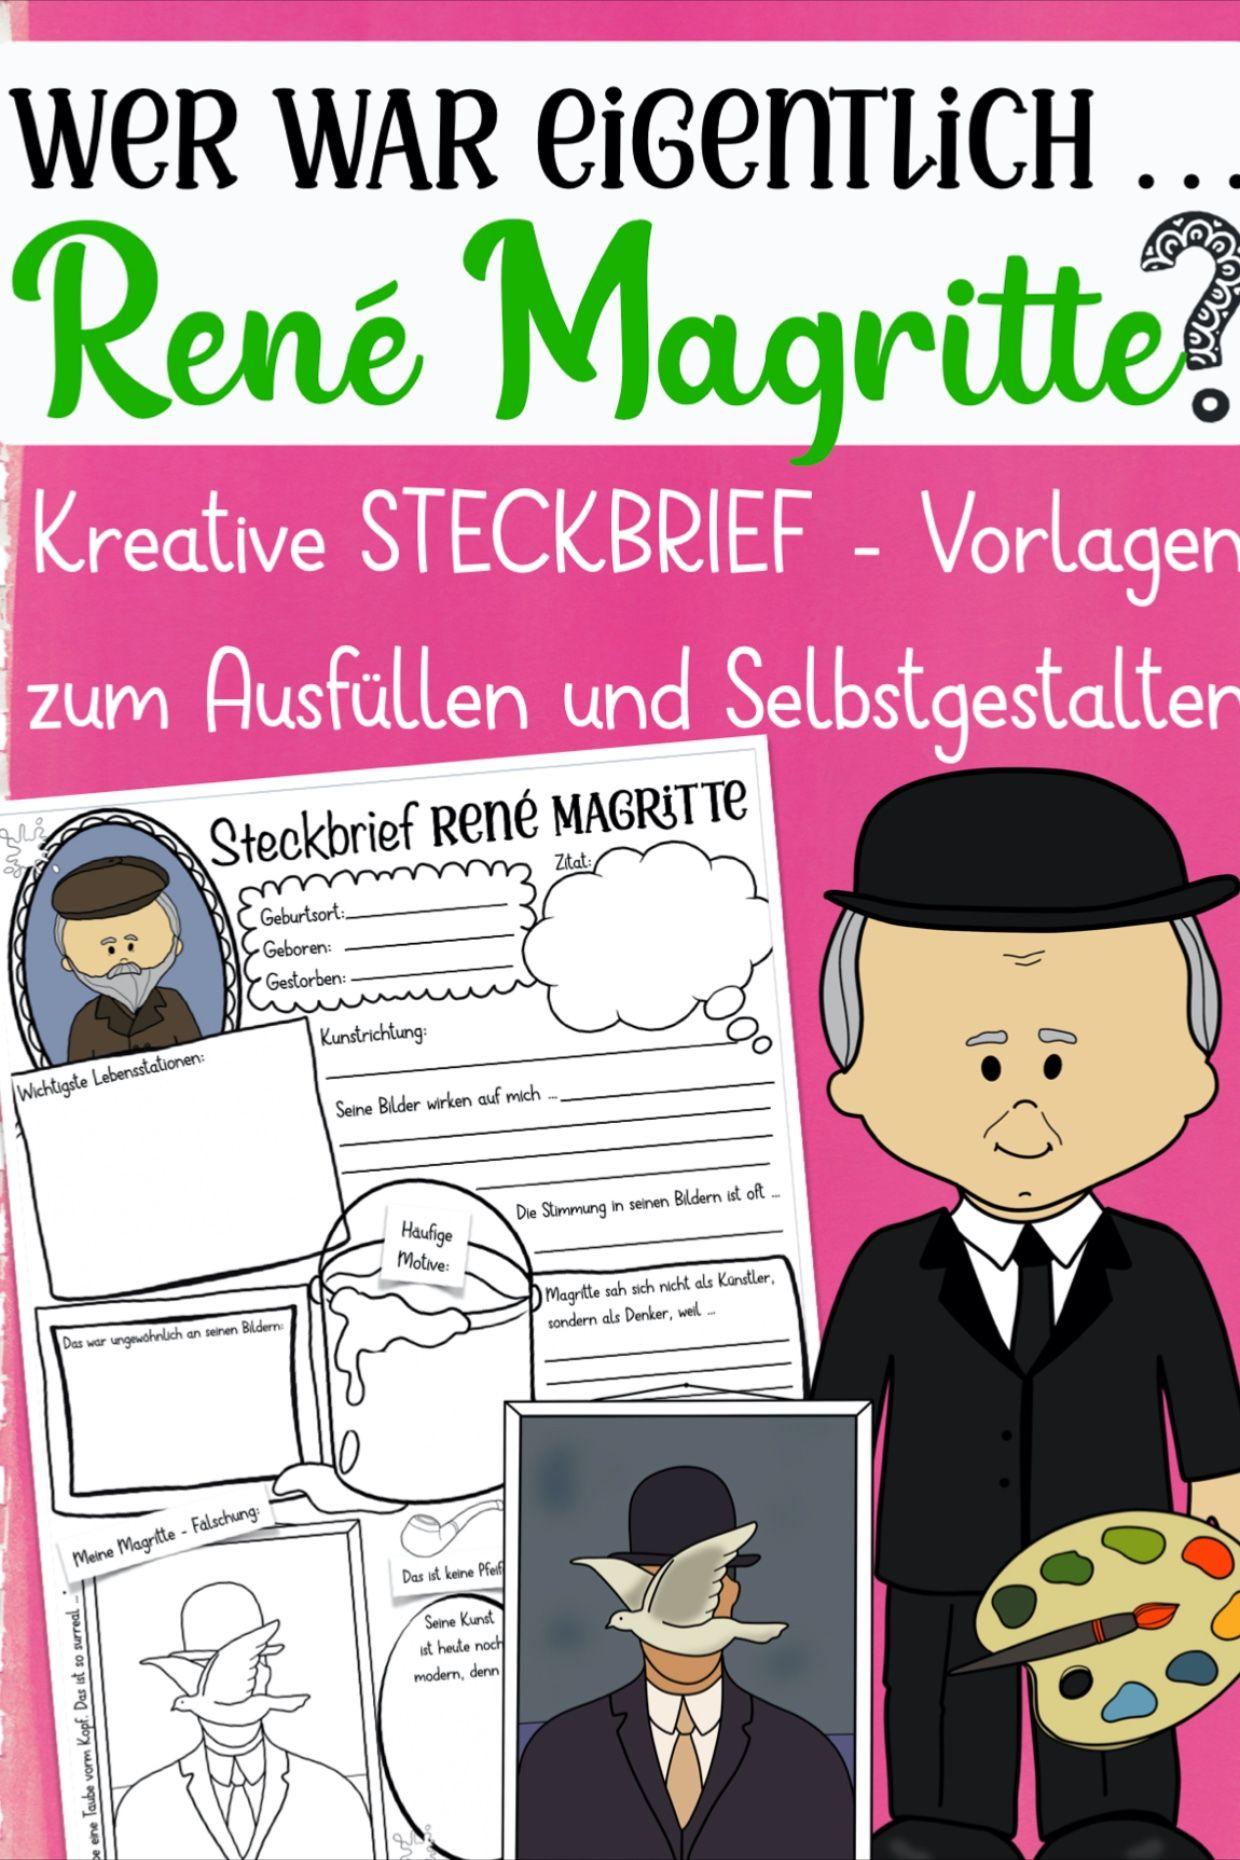 Rene Magritte Steckbrief Unterrichtsmaterial Im Fach Kunst Kunstunterricht Kunstler Grundschule Rene Magritte